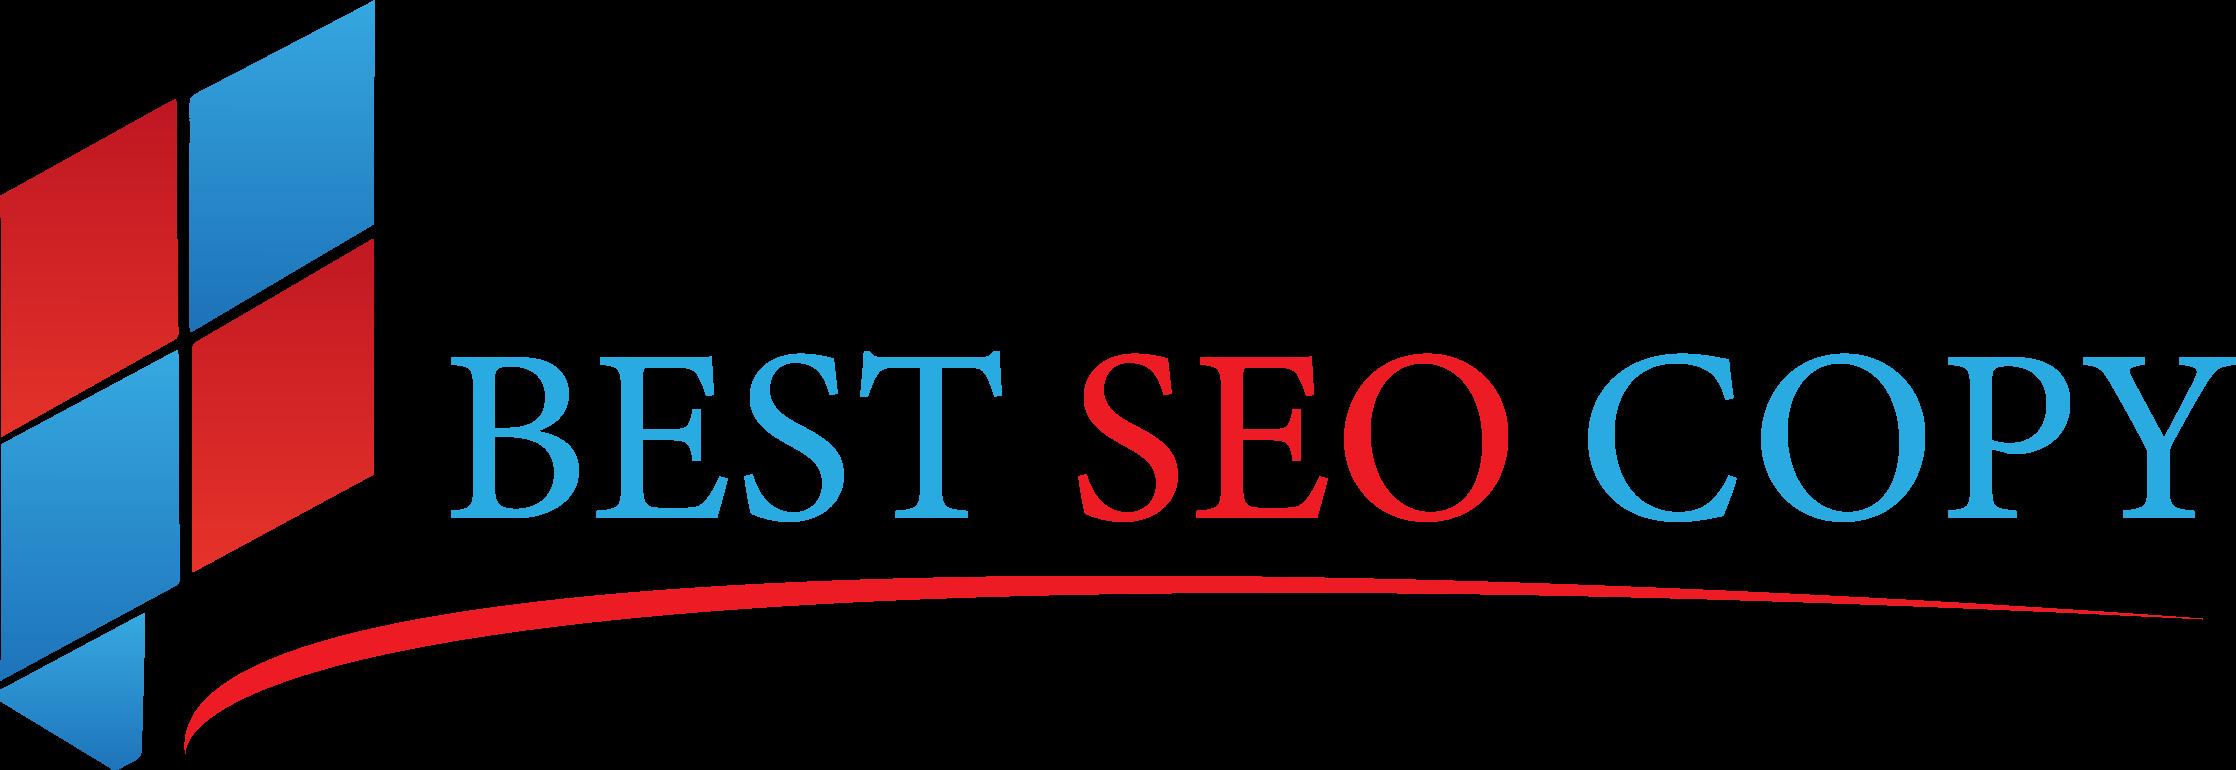 SEO Copywriting Freelance Marketing Company San Diego California